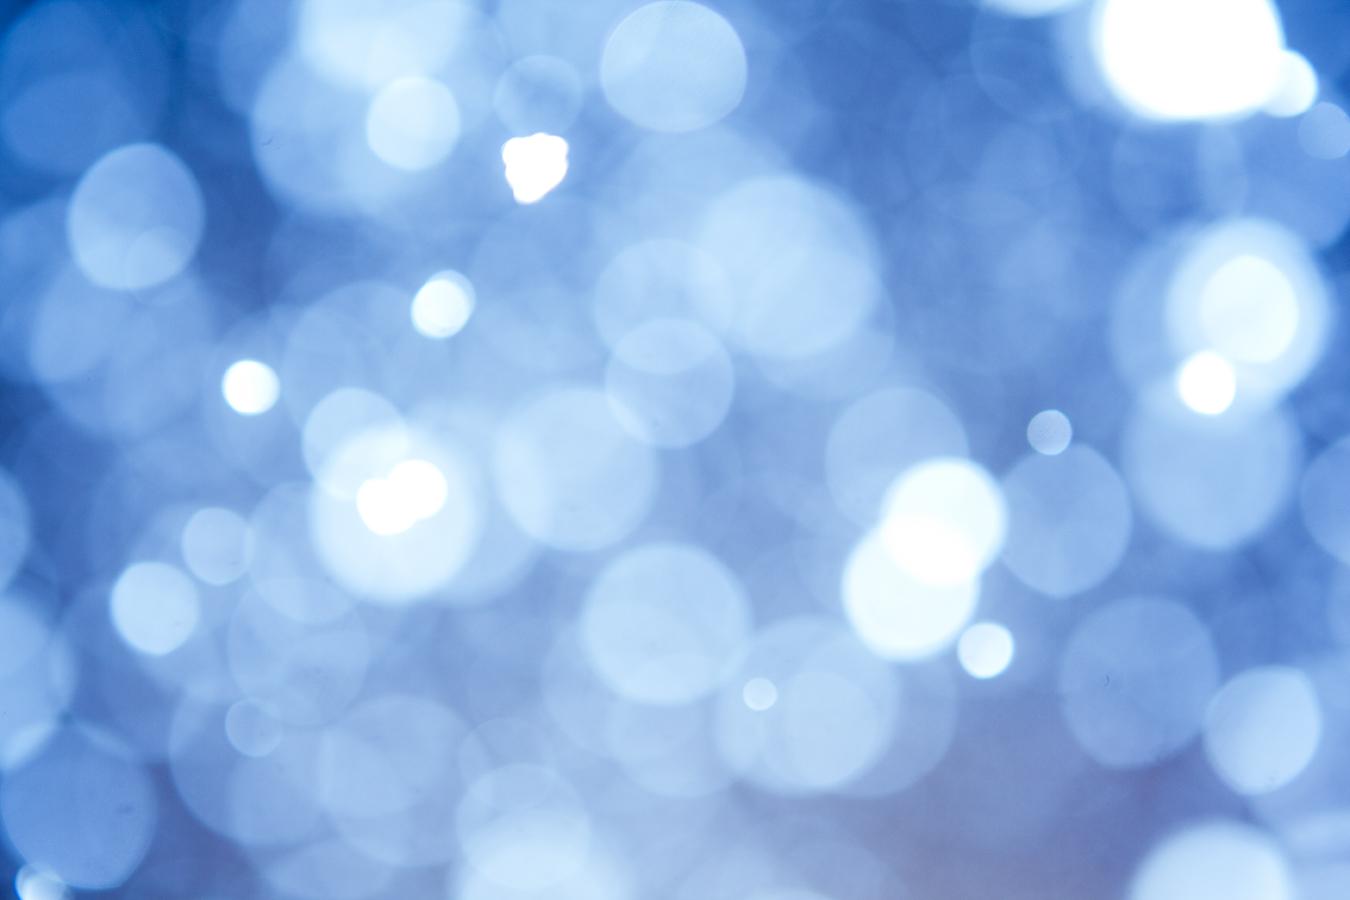 Snowflakes_SilvanoZeiter_4.jpg